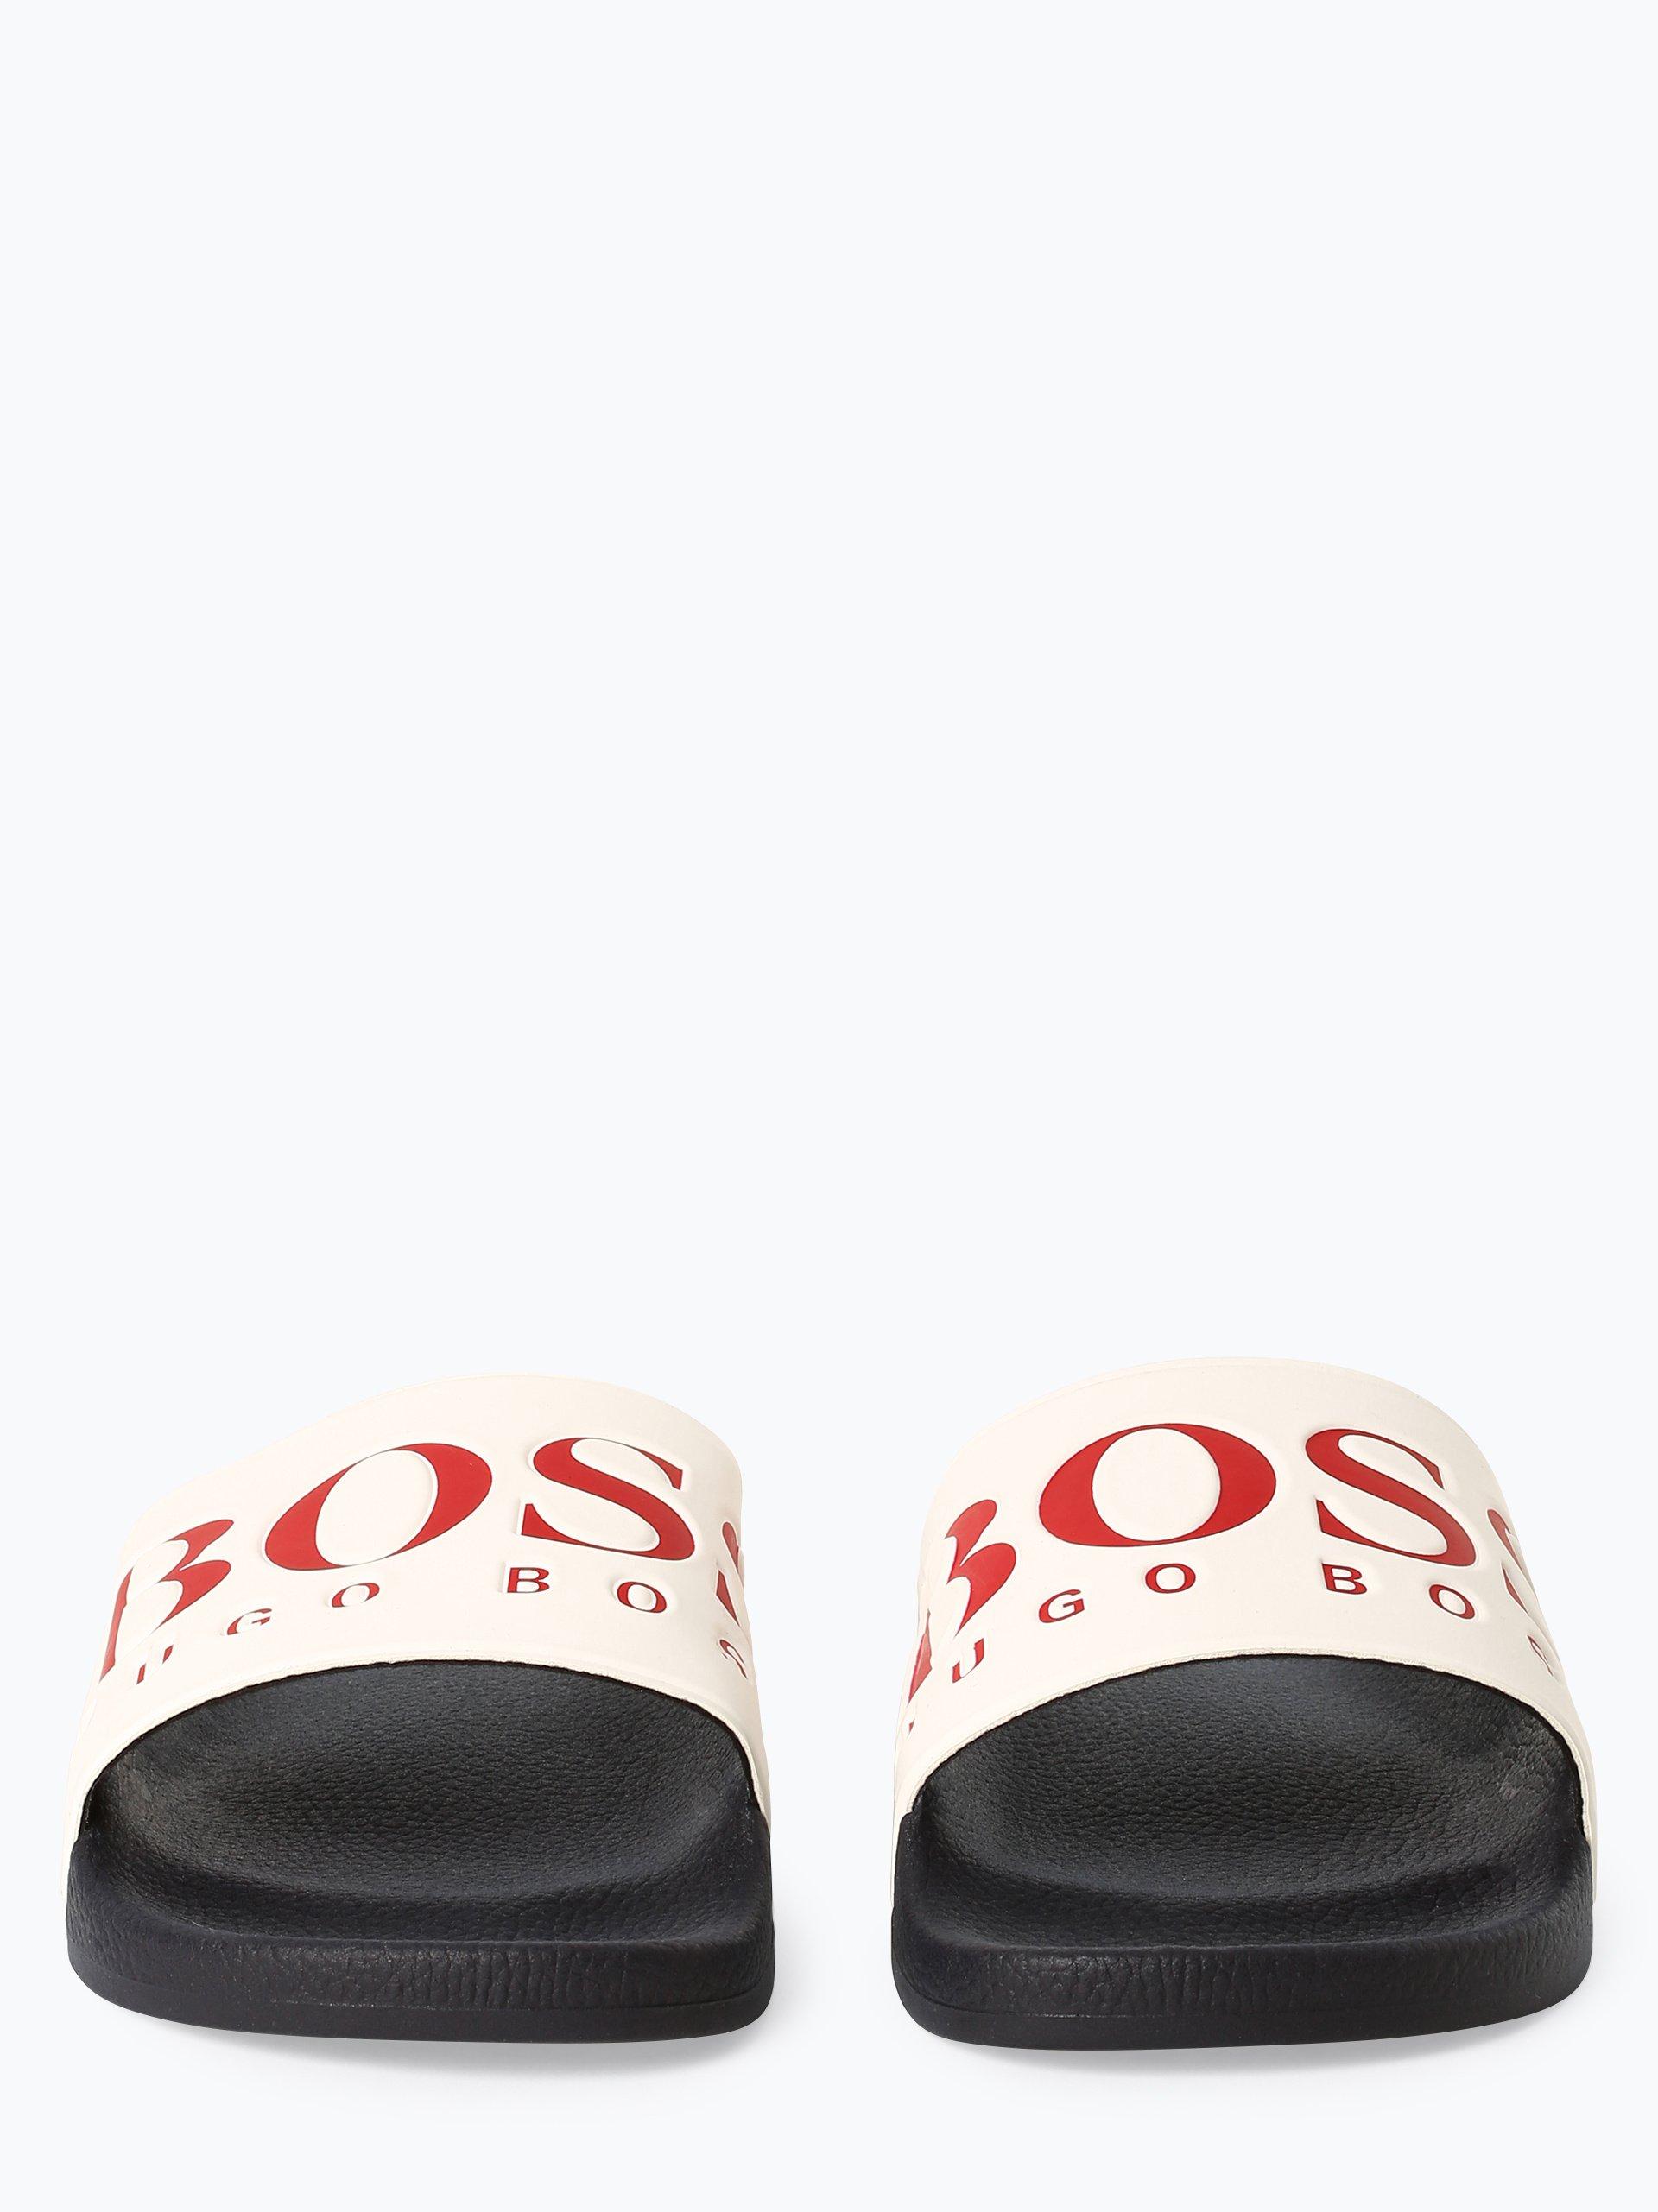 BOSS Athleisure Męskie pantofle kąpielowe – Solar_Slid_logo